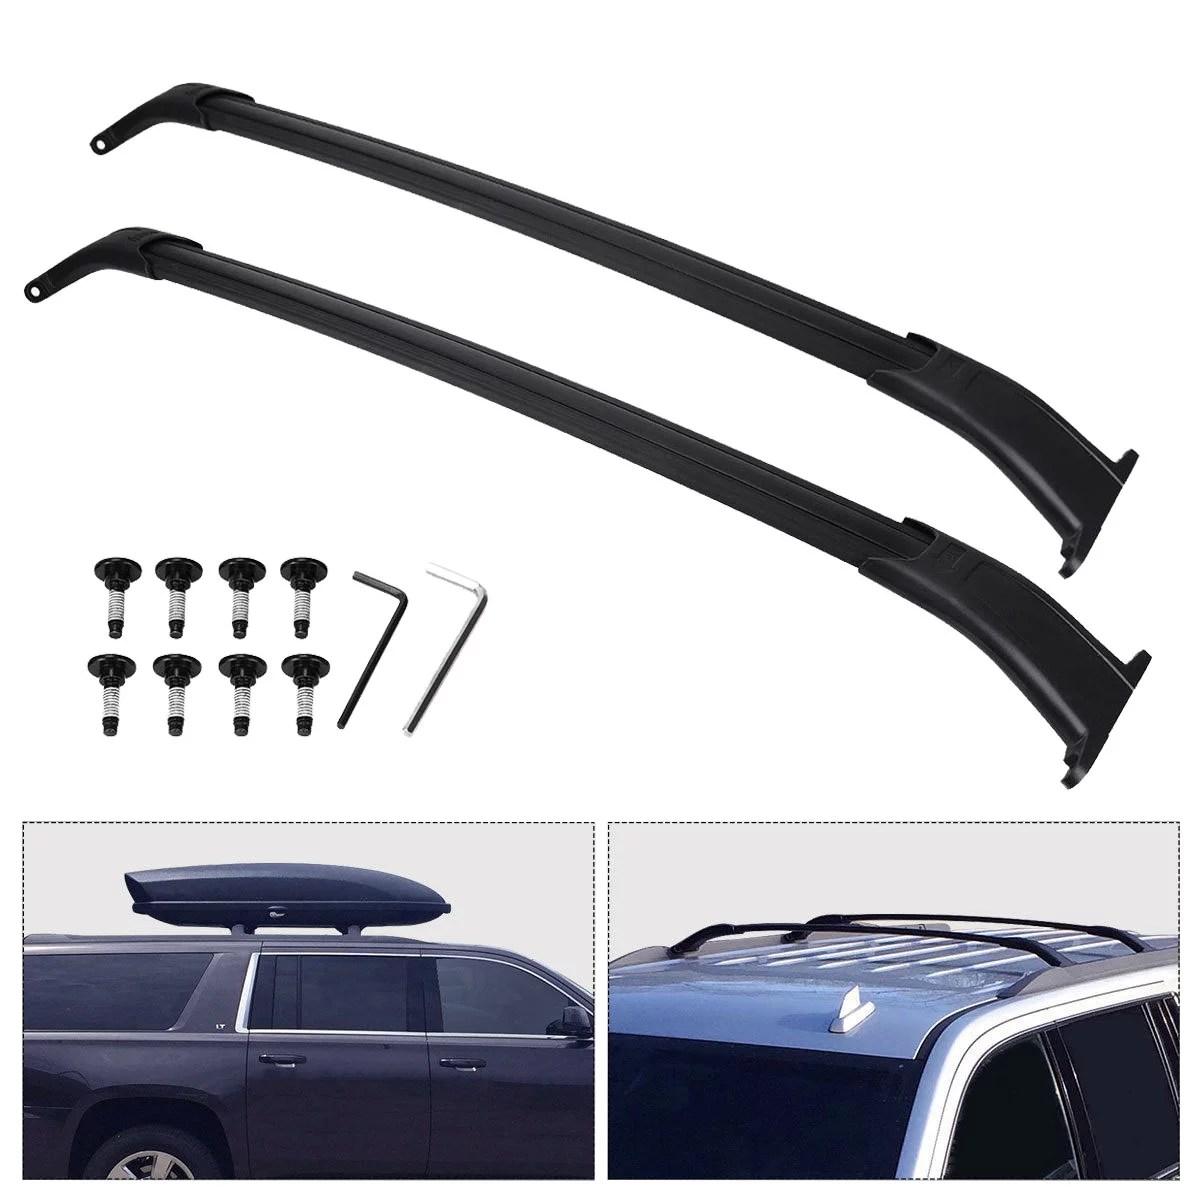 black roof rack cross bars for 2015 2020 chevy suburban chevy tahoe gmc yukon yukon xl cadillac escalade cadillac escalade esv walmart com